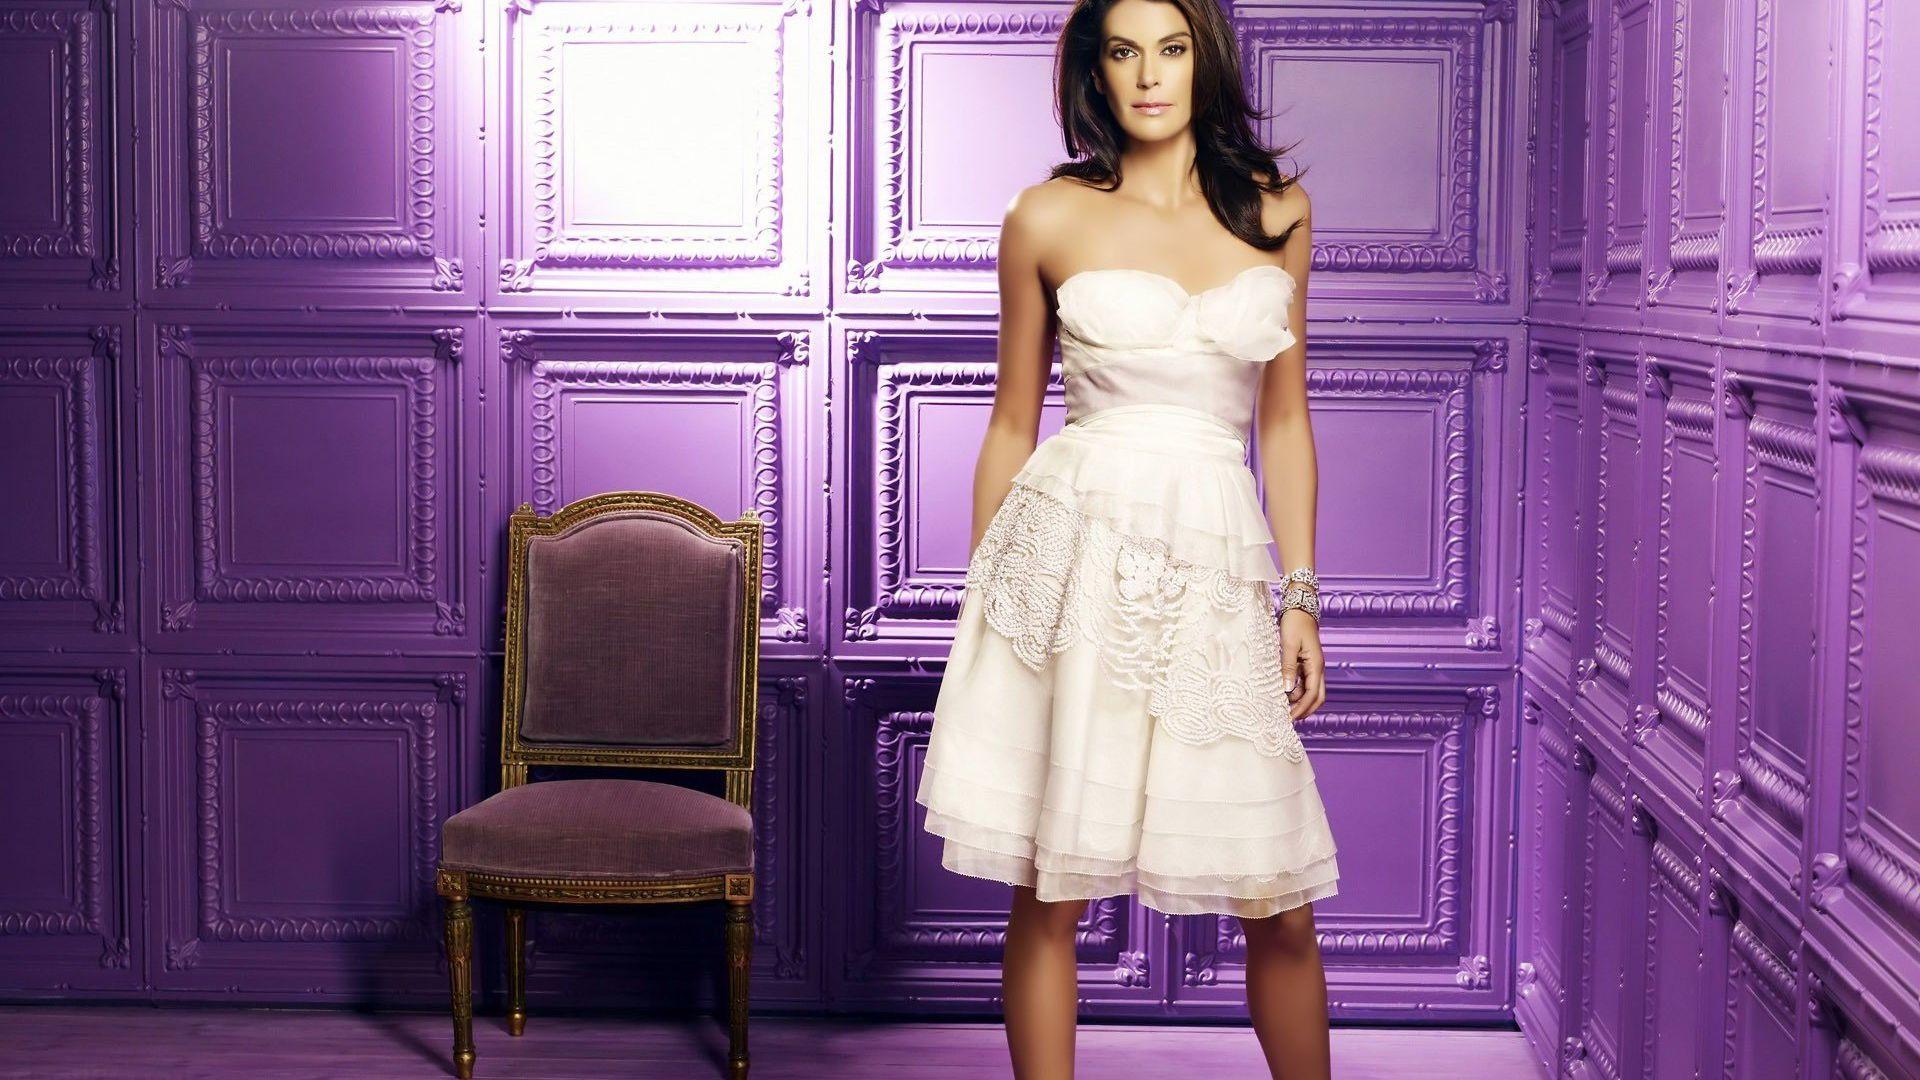 Wallpaper Teri Hatcher in white dress, chair